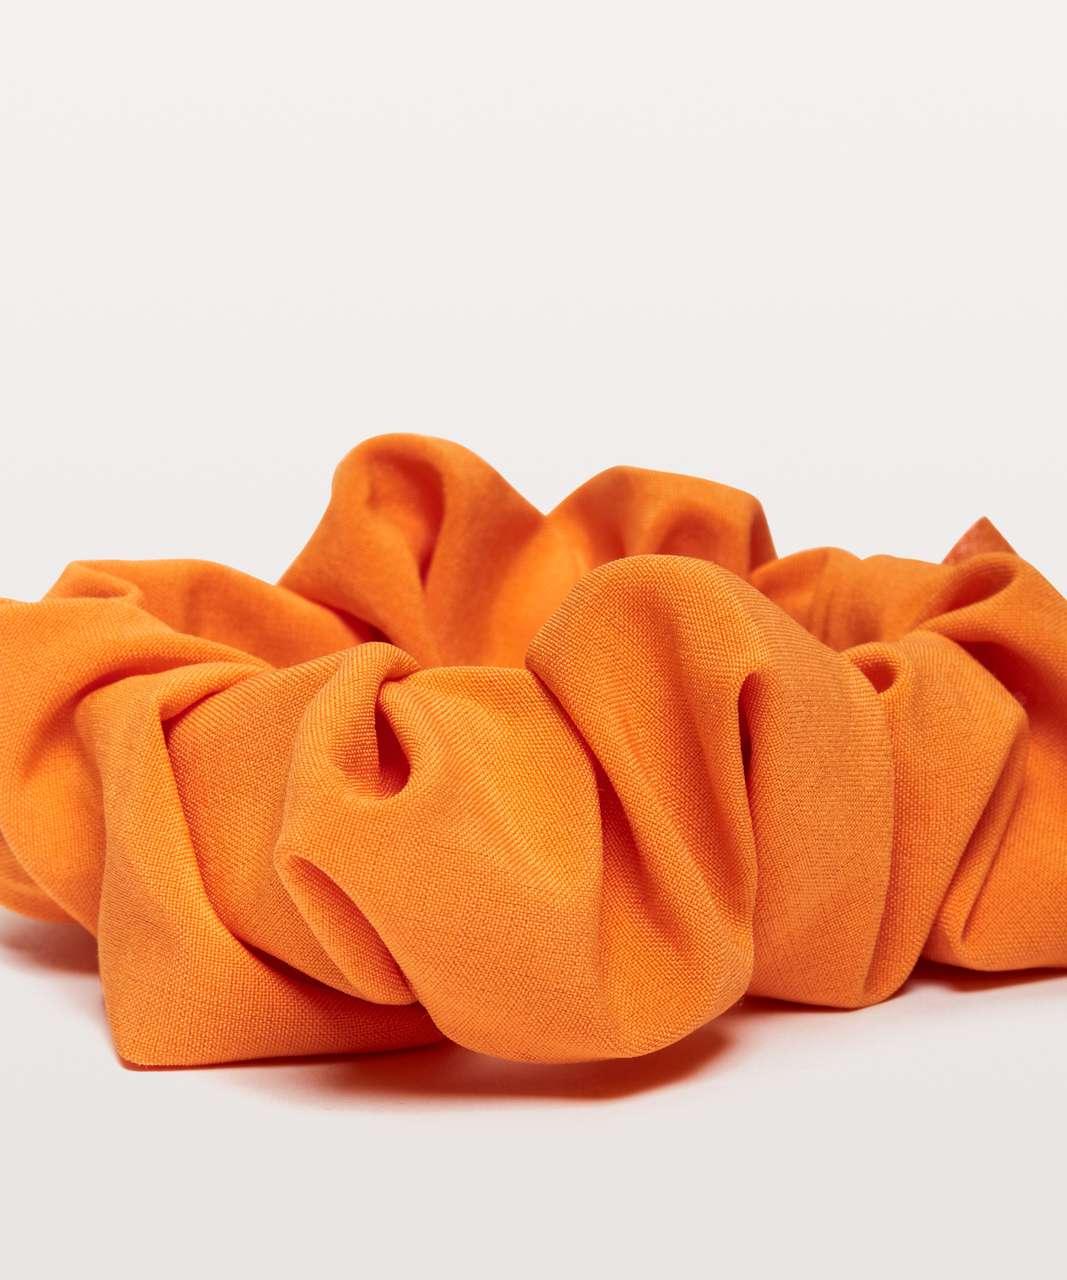 Lululemon Uplifting Scrunchie - Vivid Amber